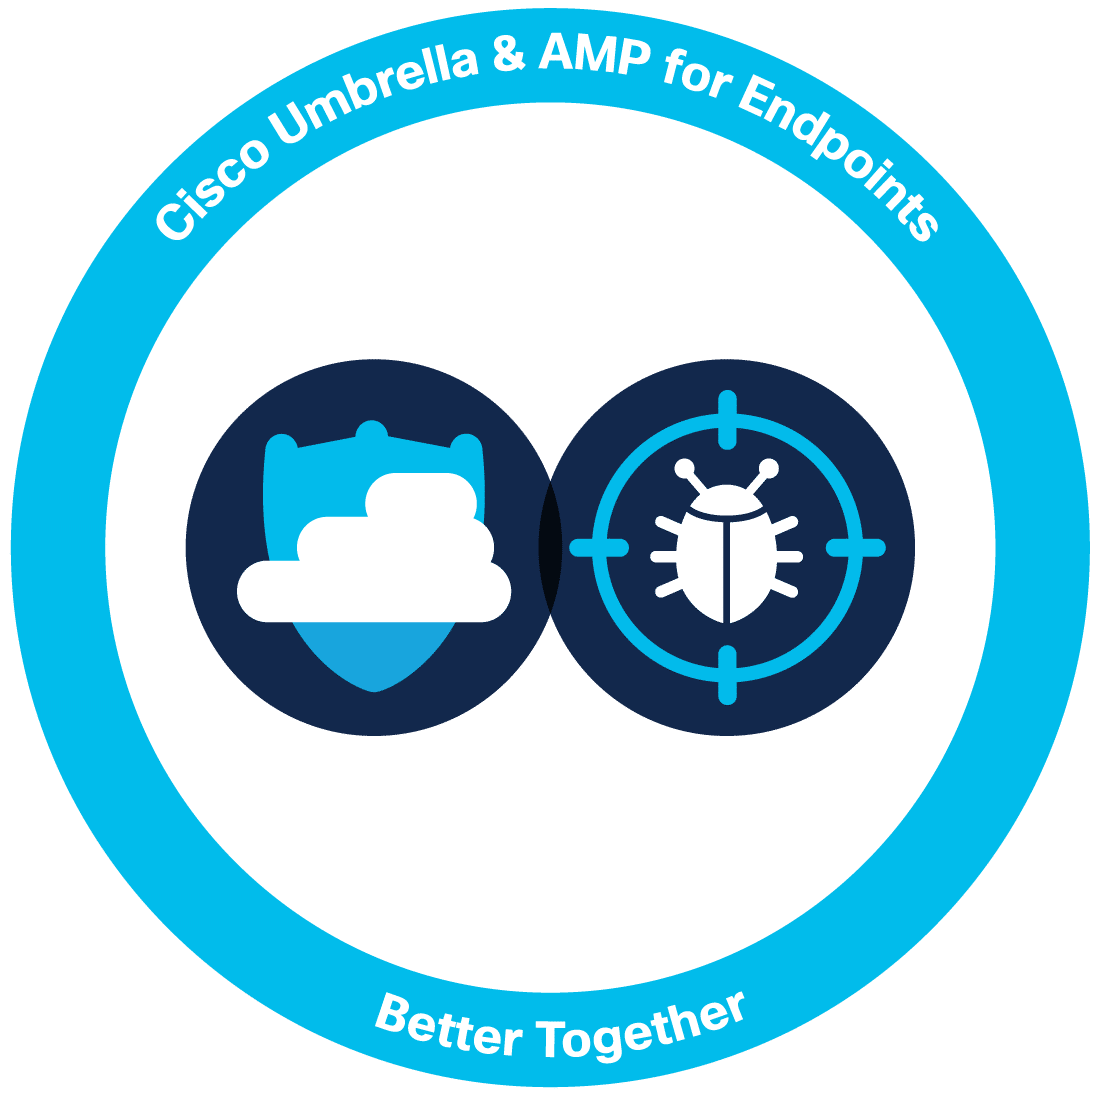 Umbrell and Amp - Better together illustration